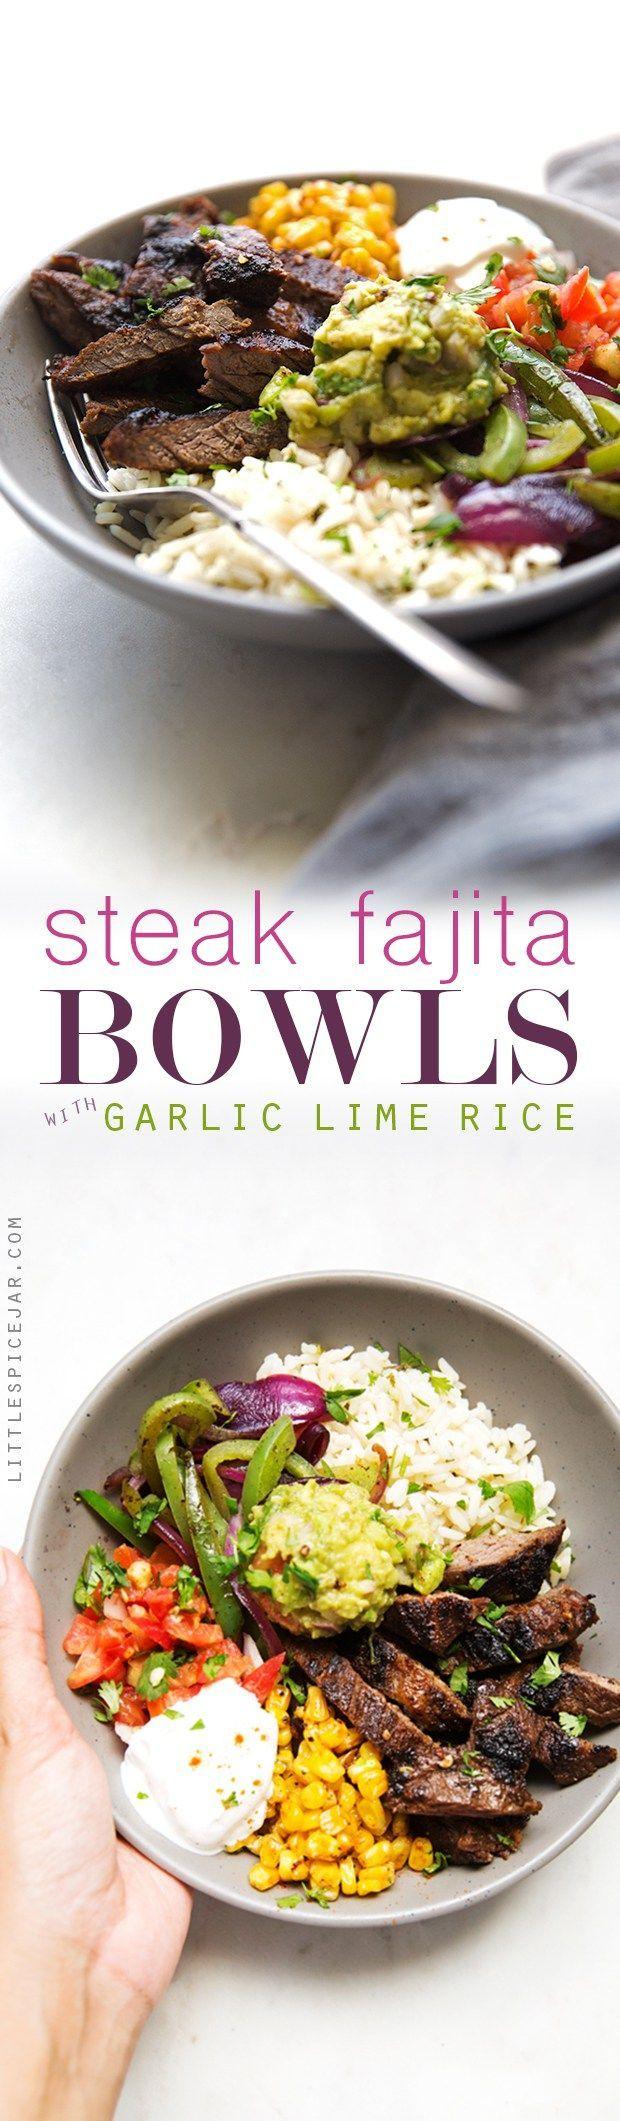 how to cook sirloin tip steak for fajitas